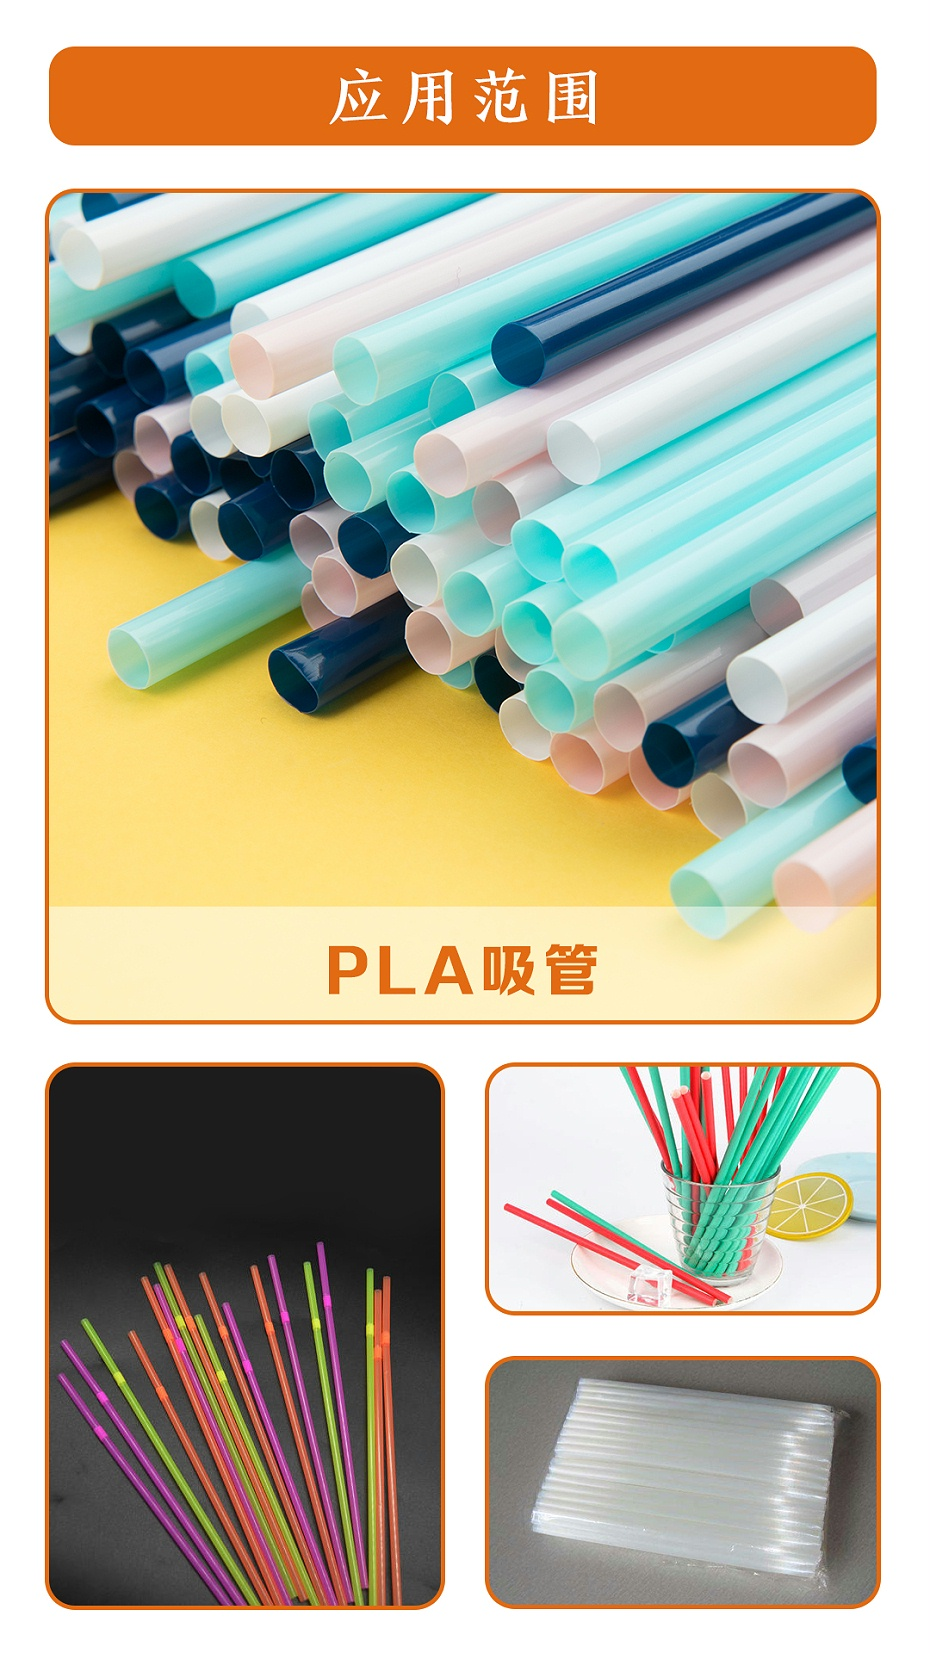 PLA吸管应用